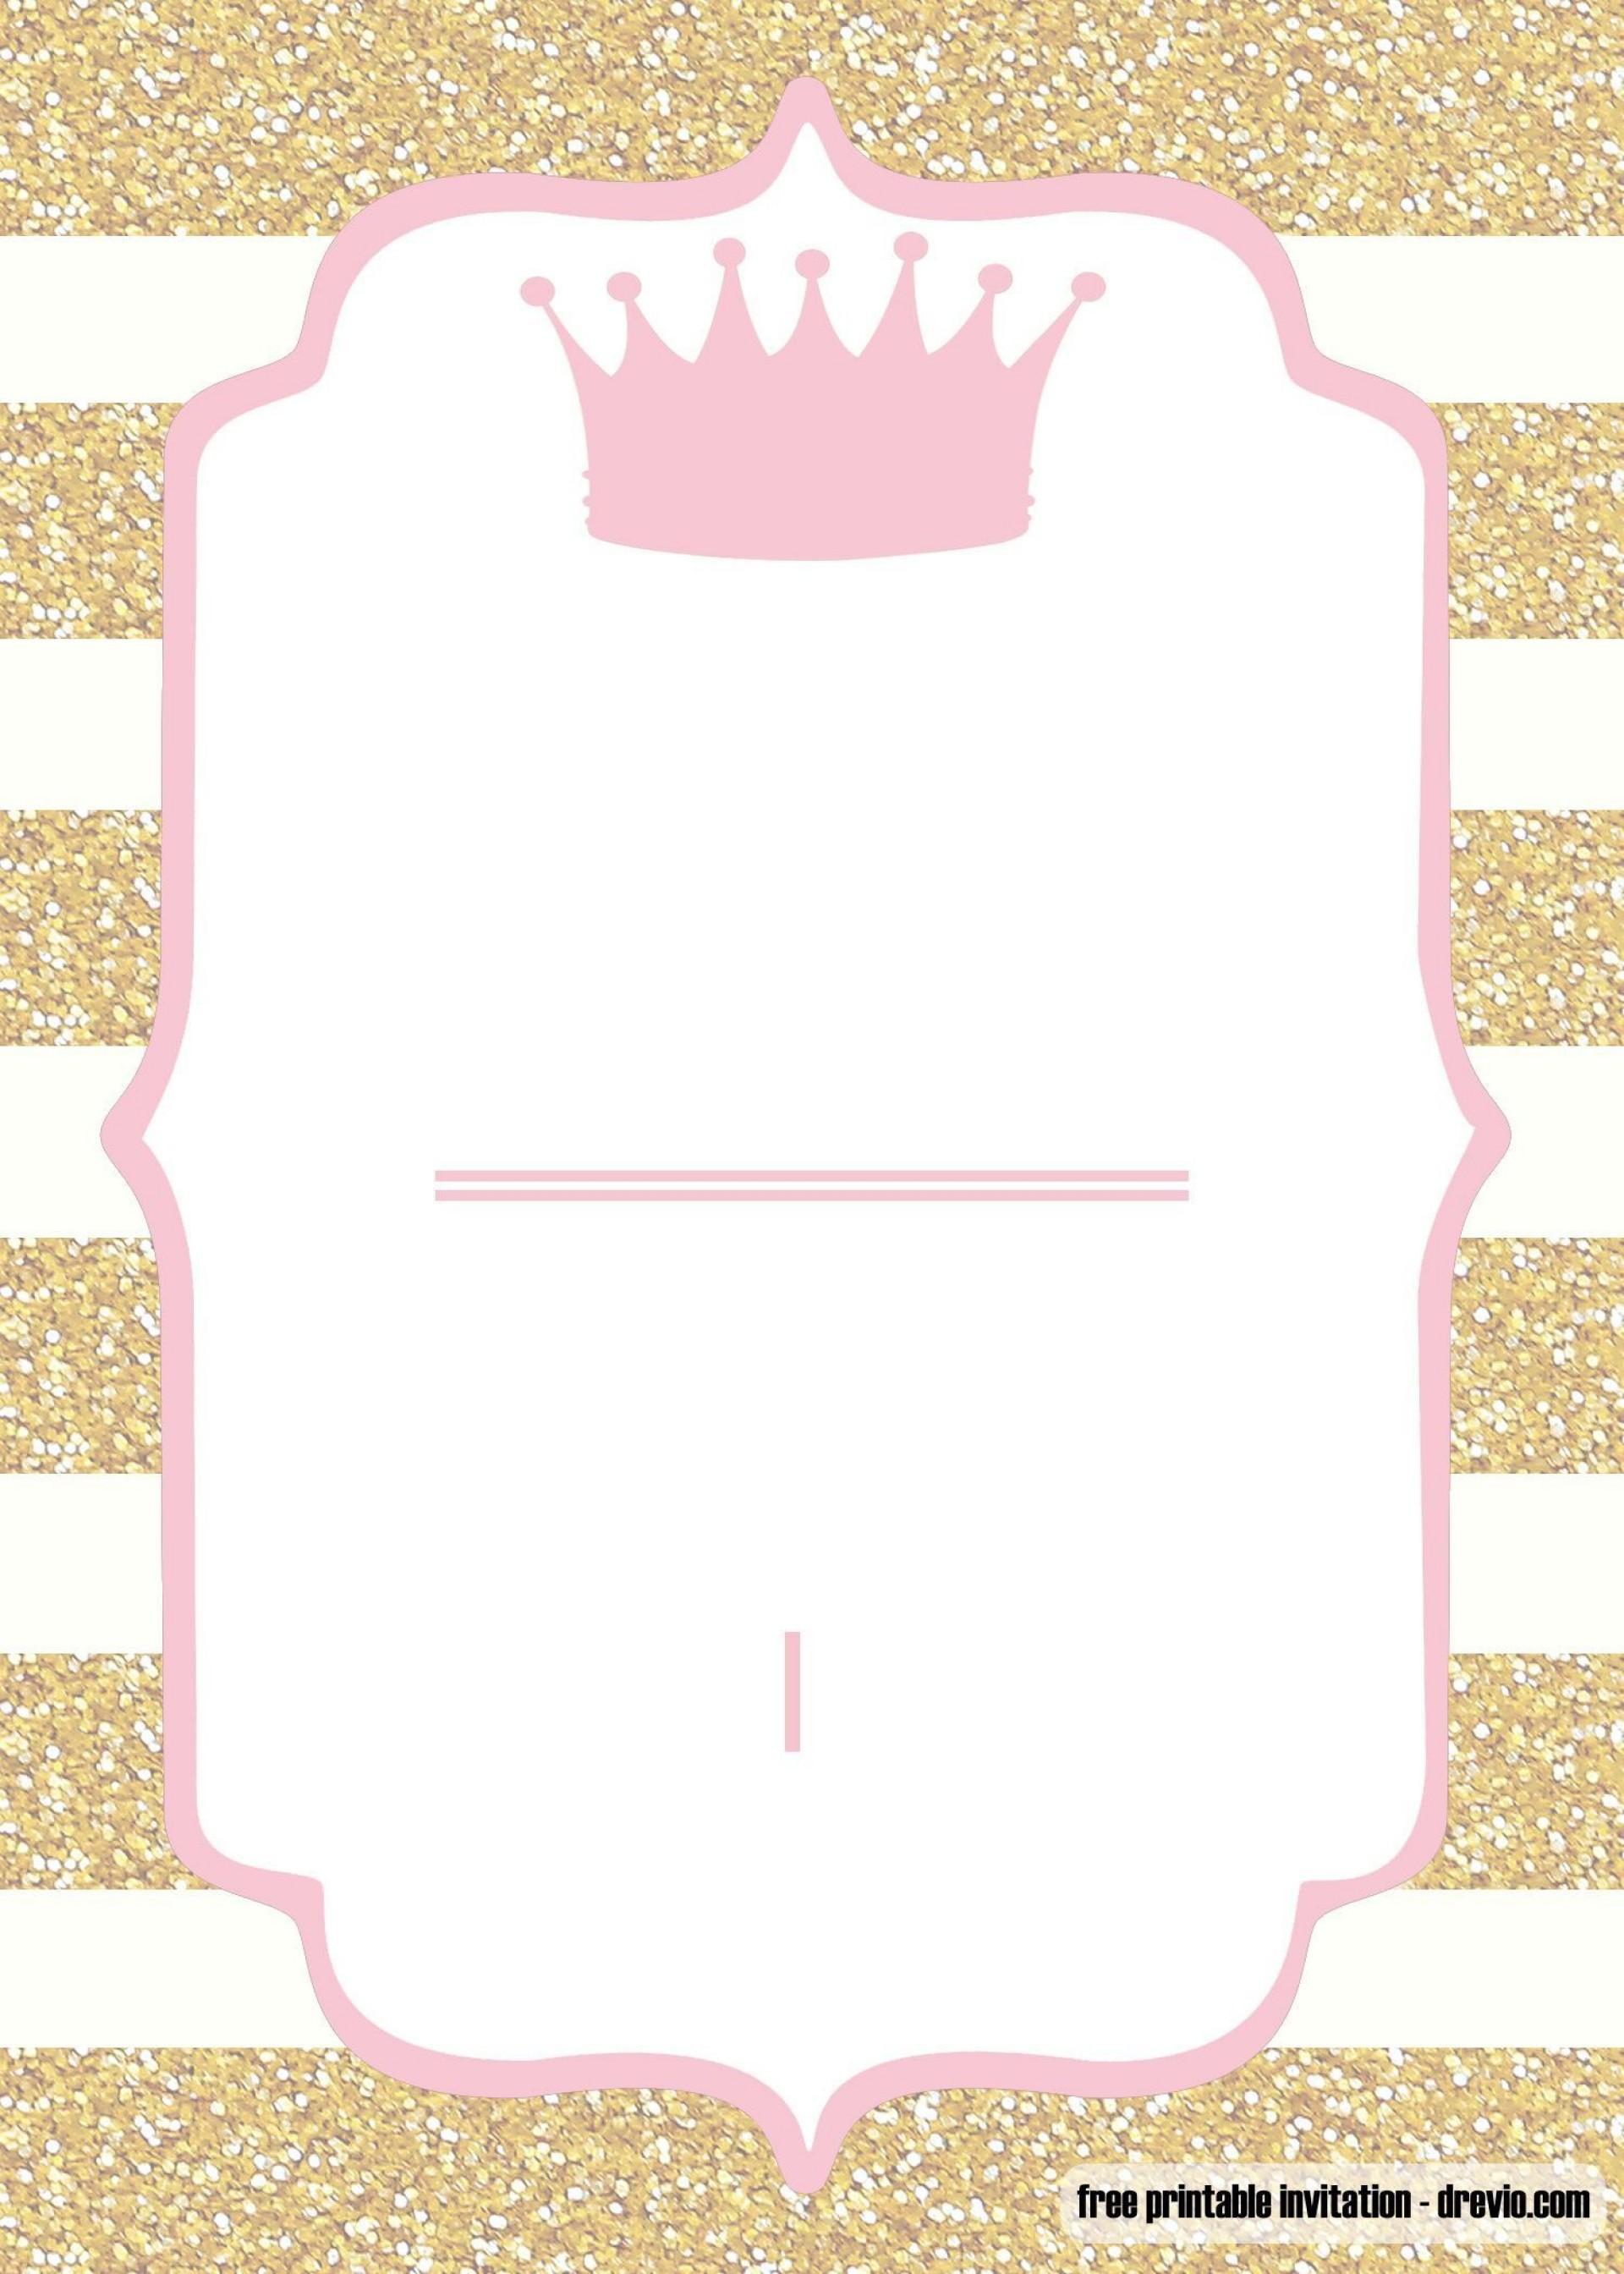 009 Shocking Baby Shower Template Free Printable Design  Superhero Invitation For A Boy Diaper1920